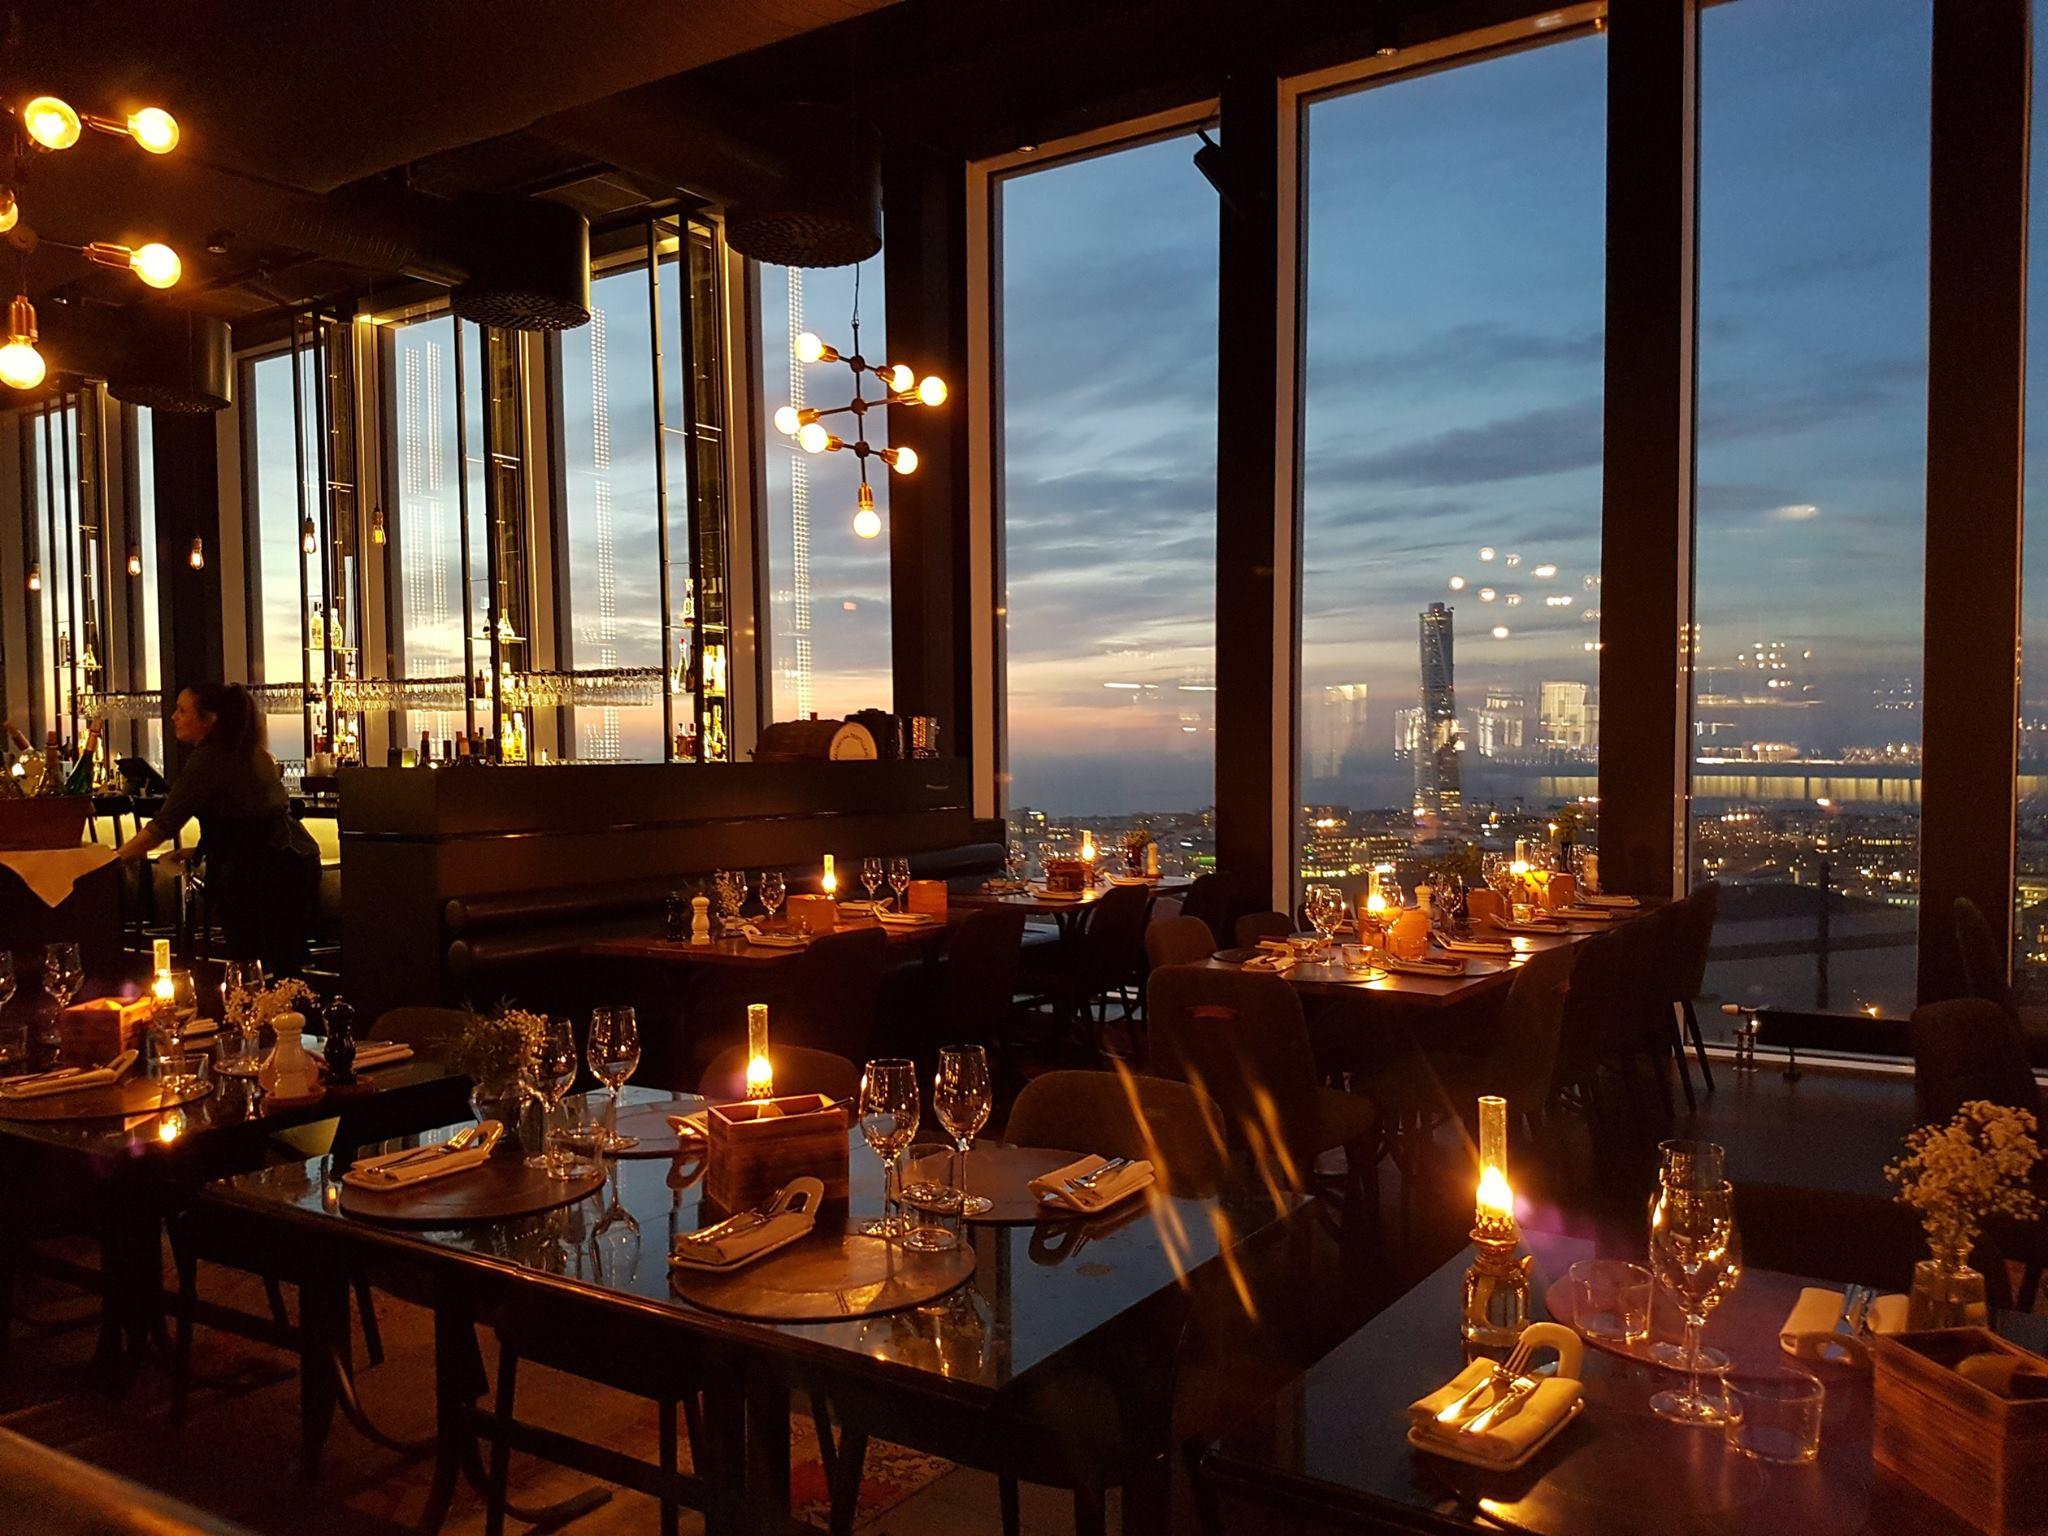 Kitchen&Table skybar